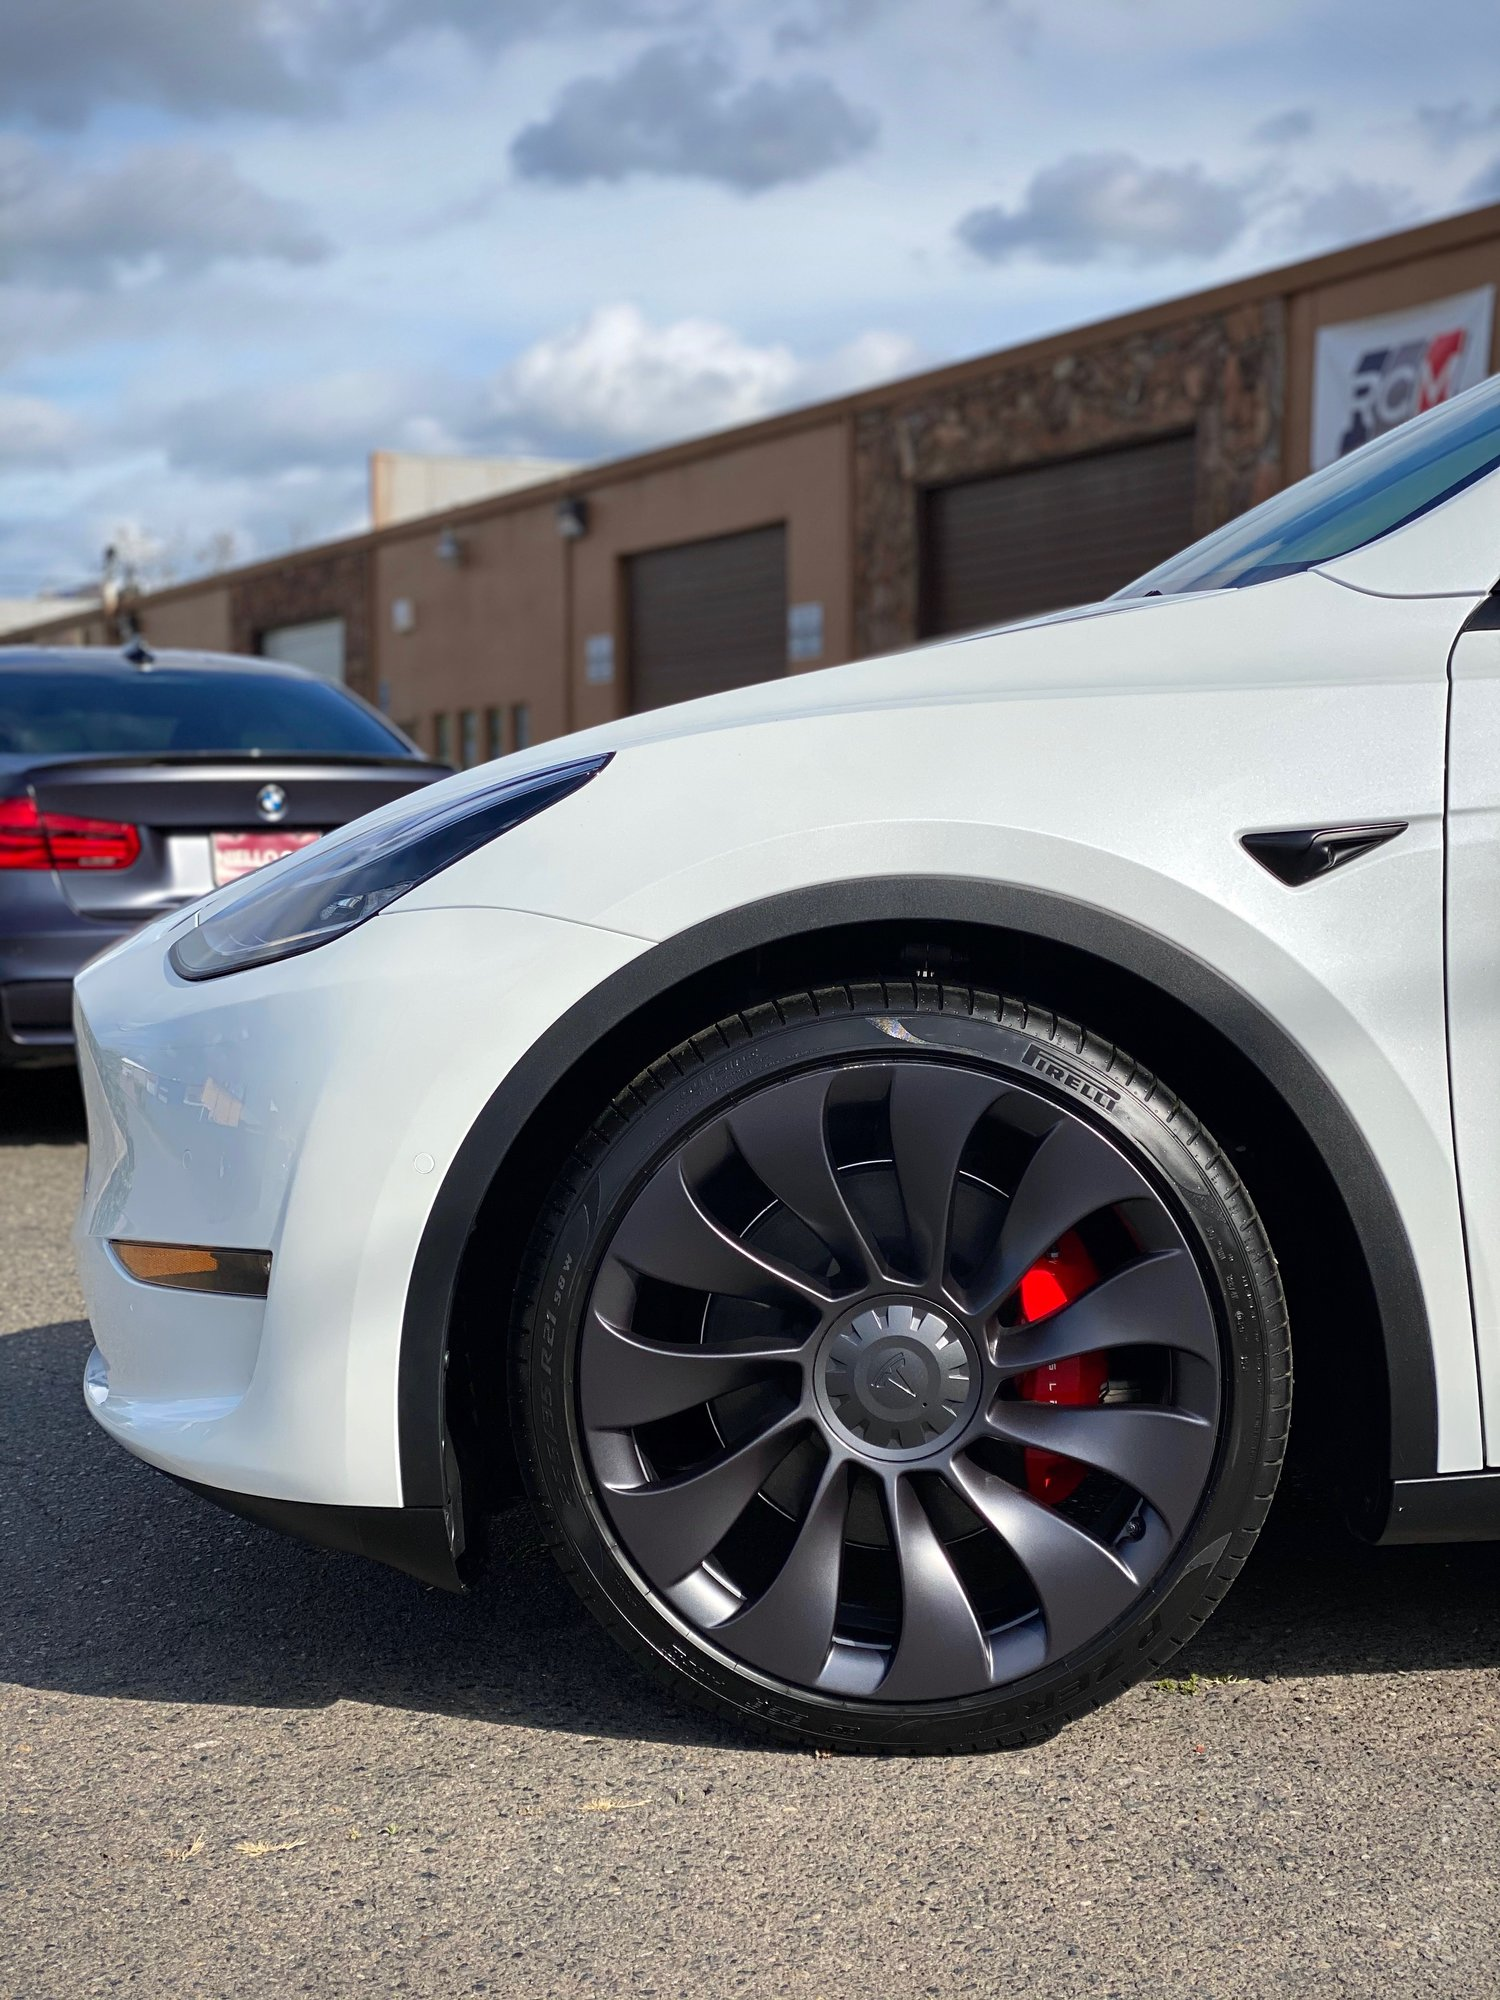 2020 Tesla Model Y Pearl White Multi-Coat  (Appearance Solutions-Sacramento,CA)~37.JPG